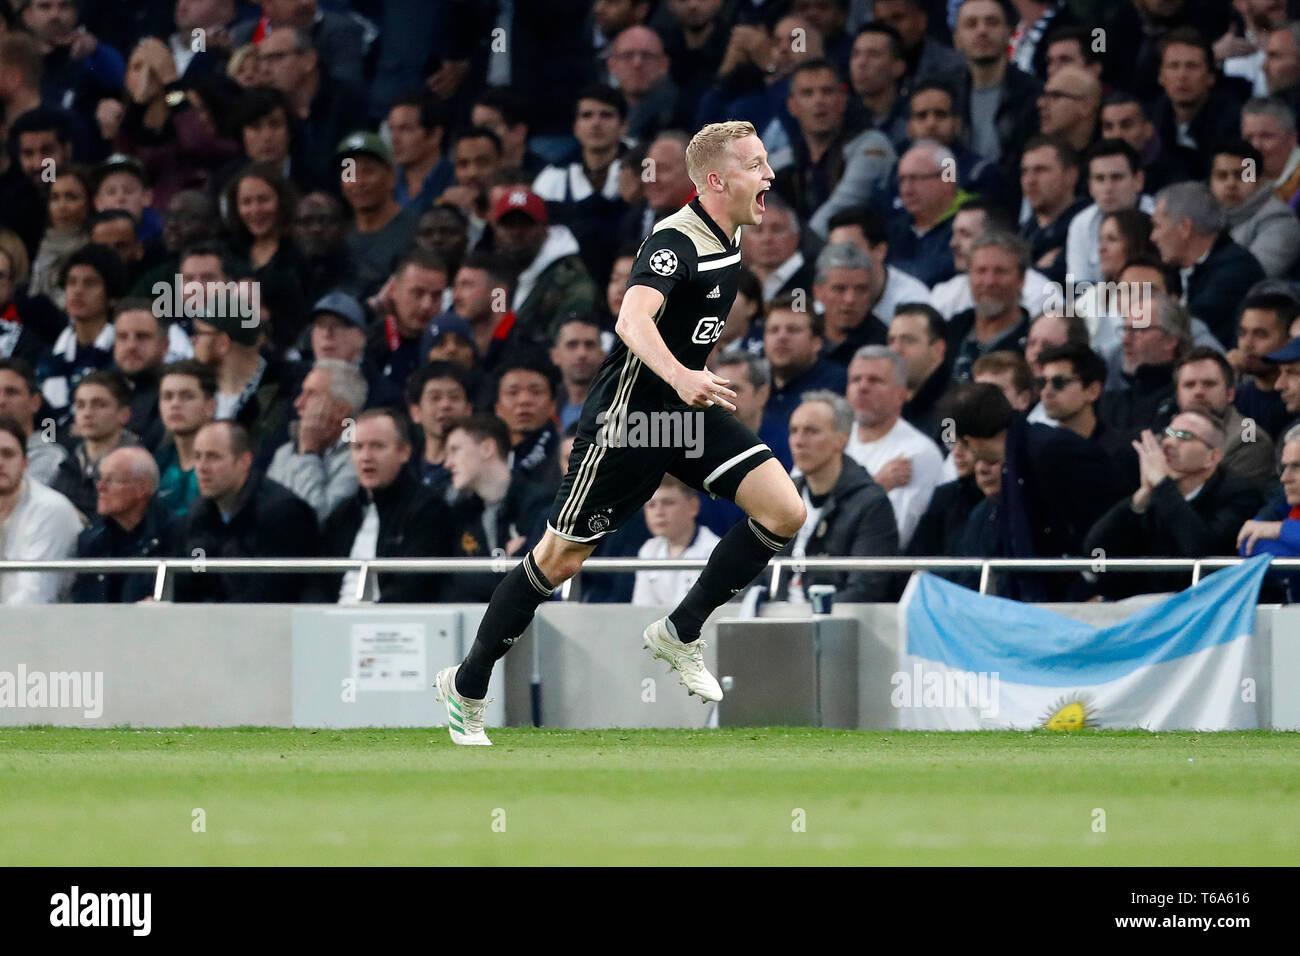 LONDON Football, 30-04-2019, season 2018 / 2019 , Tottenham Stadium . Semi final Champions League first leg. Ajax player Donny van de Beek celebrating the 0-1 during the game Tottenham Hotspur - Ajax - Stock Image